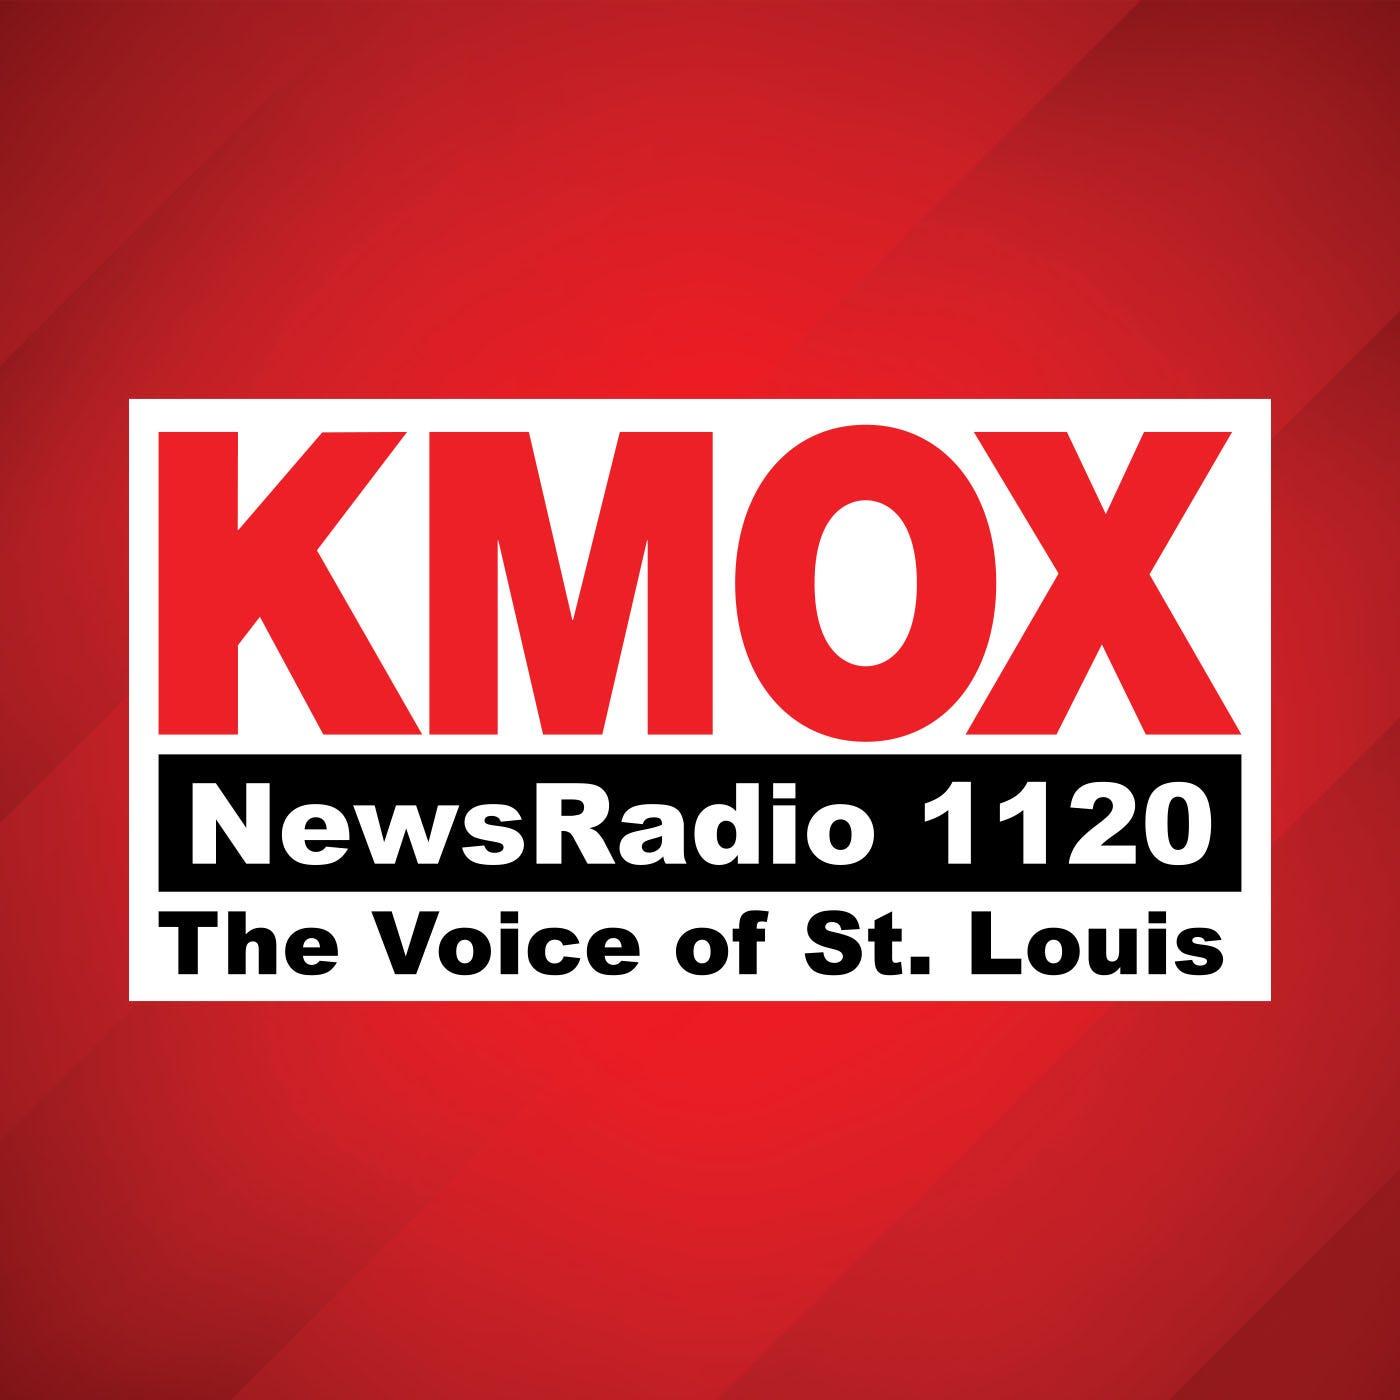 kmox.radio.com